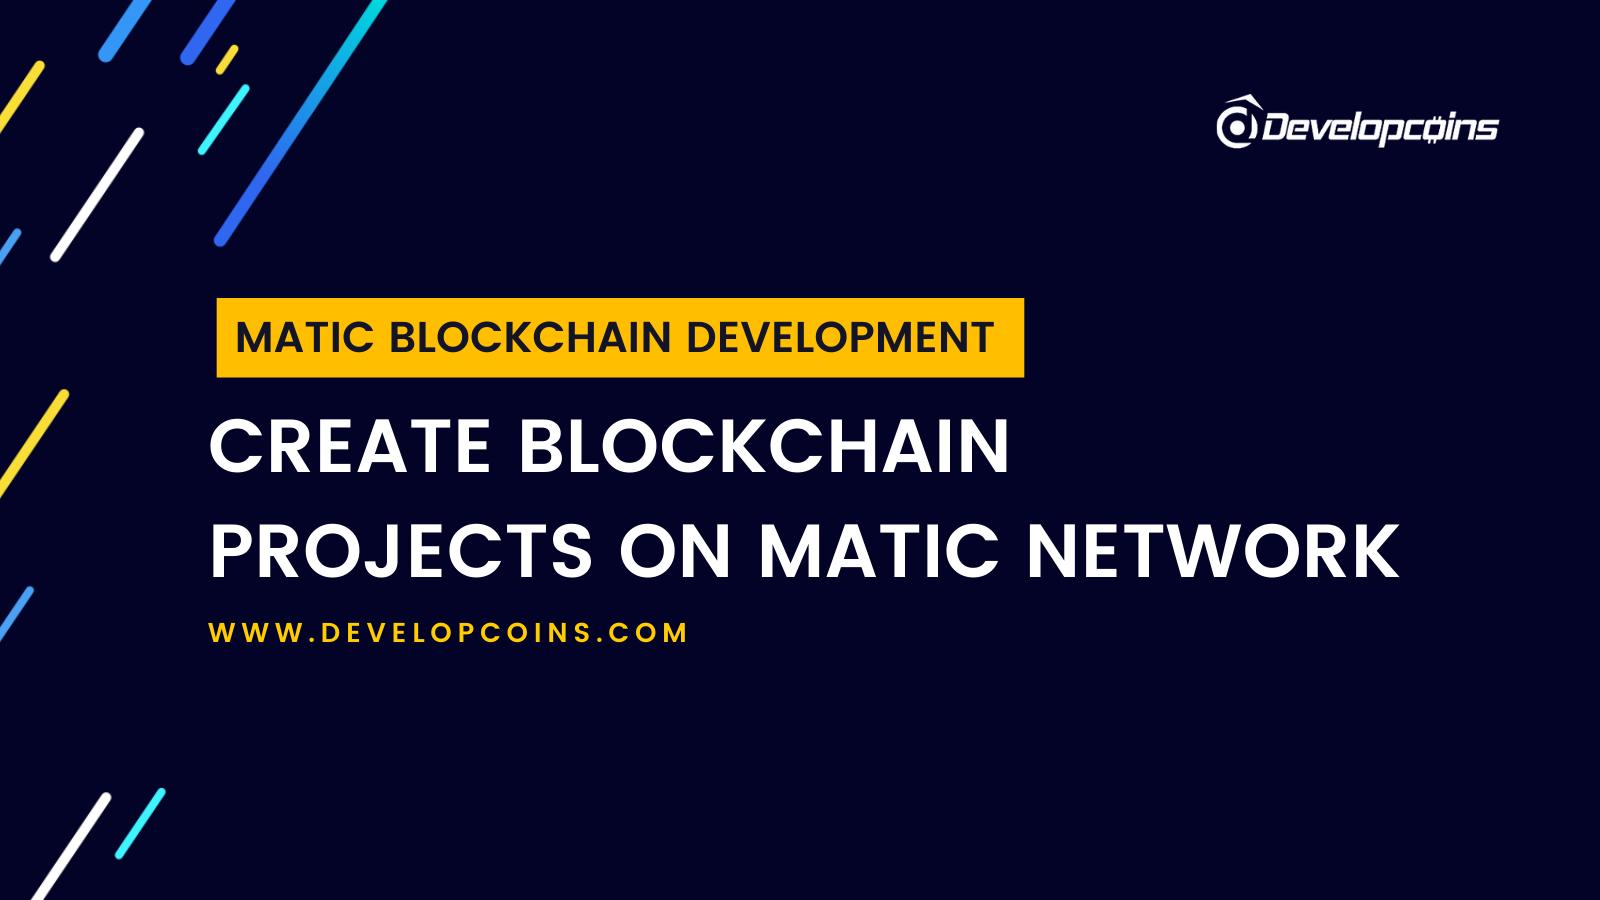 Matic Blockchain Development - To Create A Project On Matic Blockchain Network